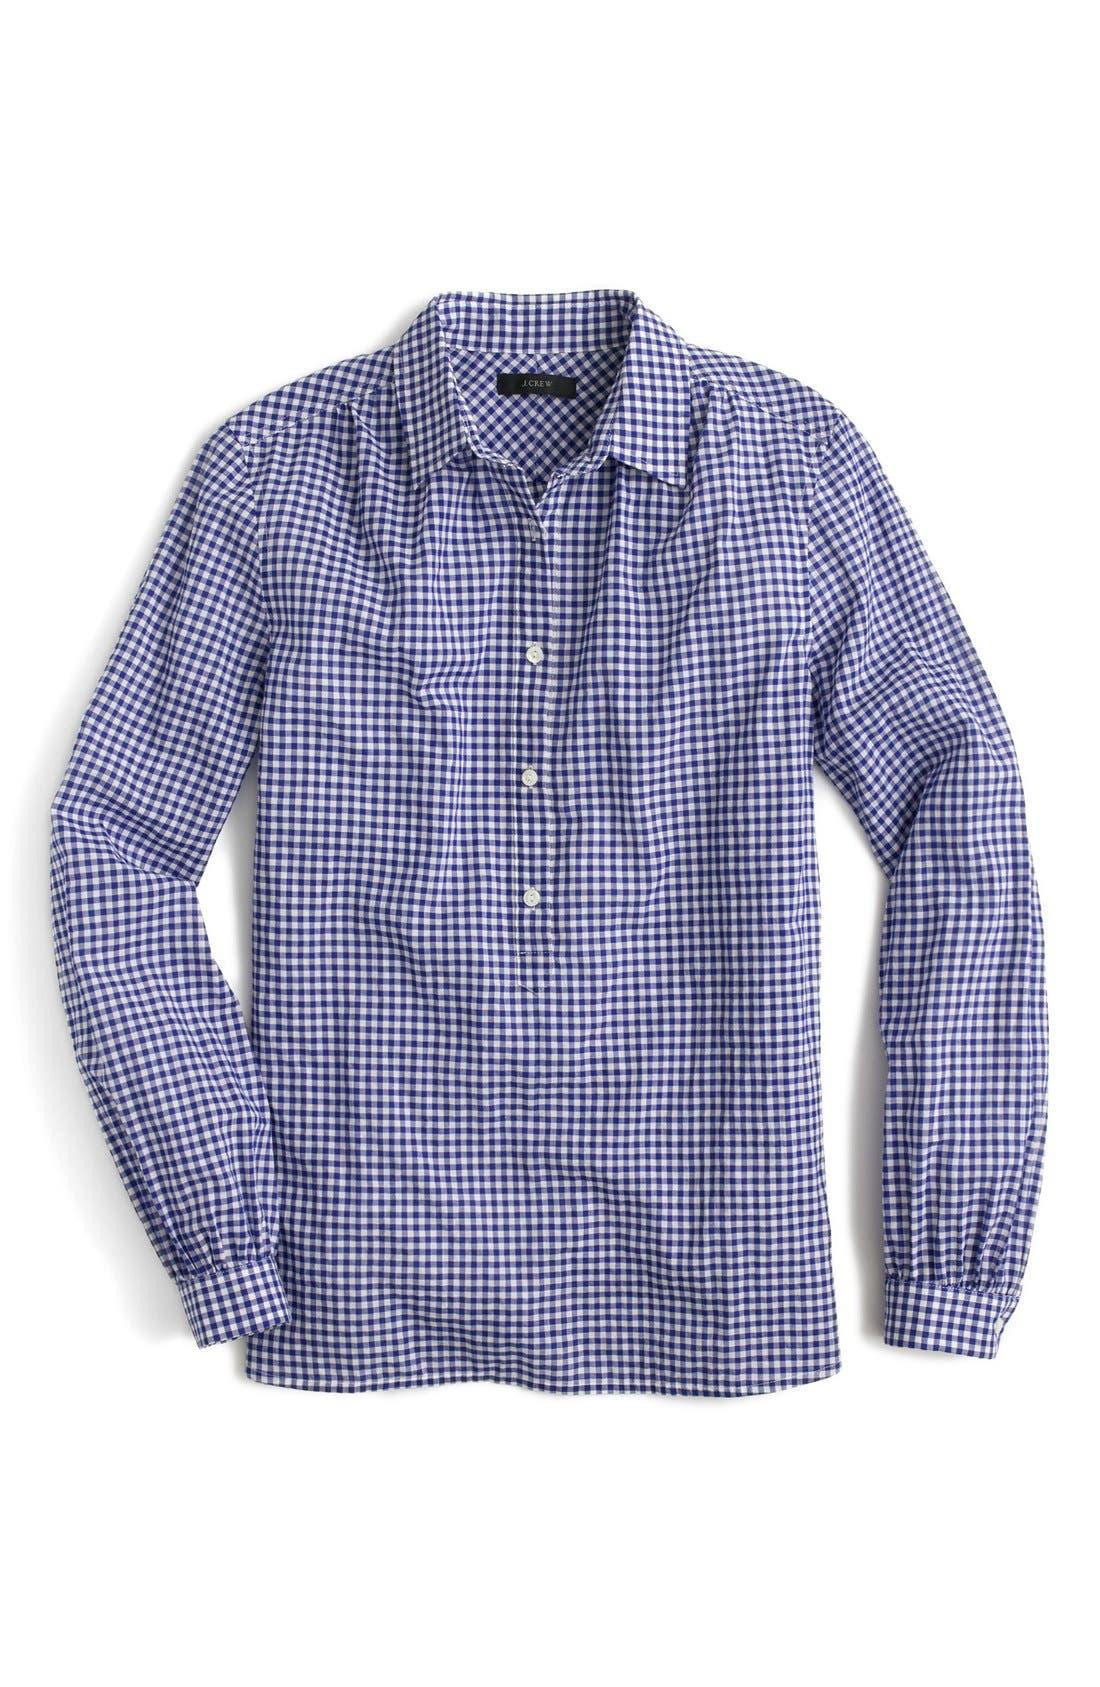 Alternate Image 3  - J.Crew Gathered Gingham Popover Shirt (Regular & Petite)